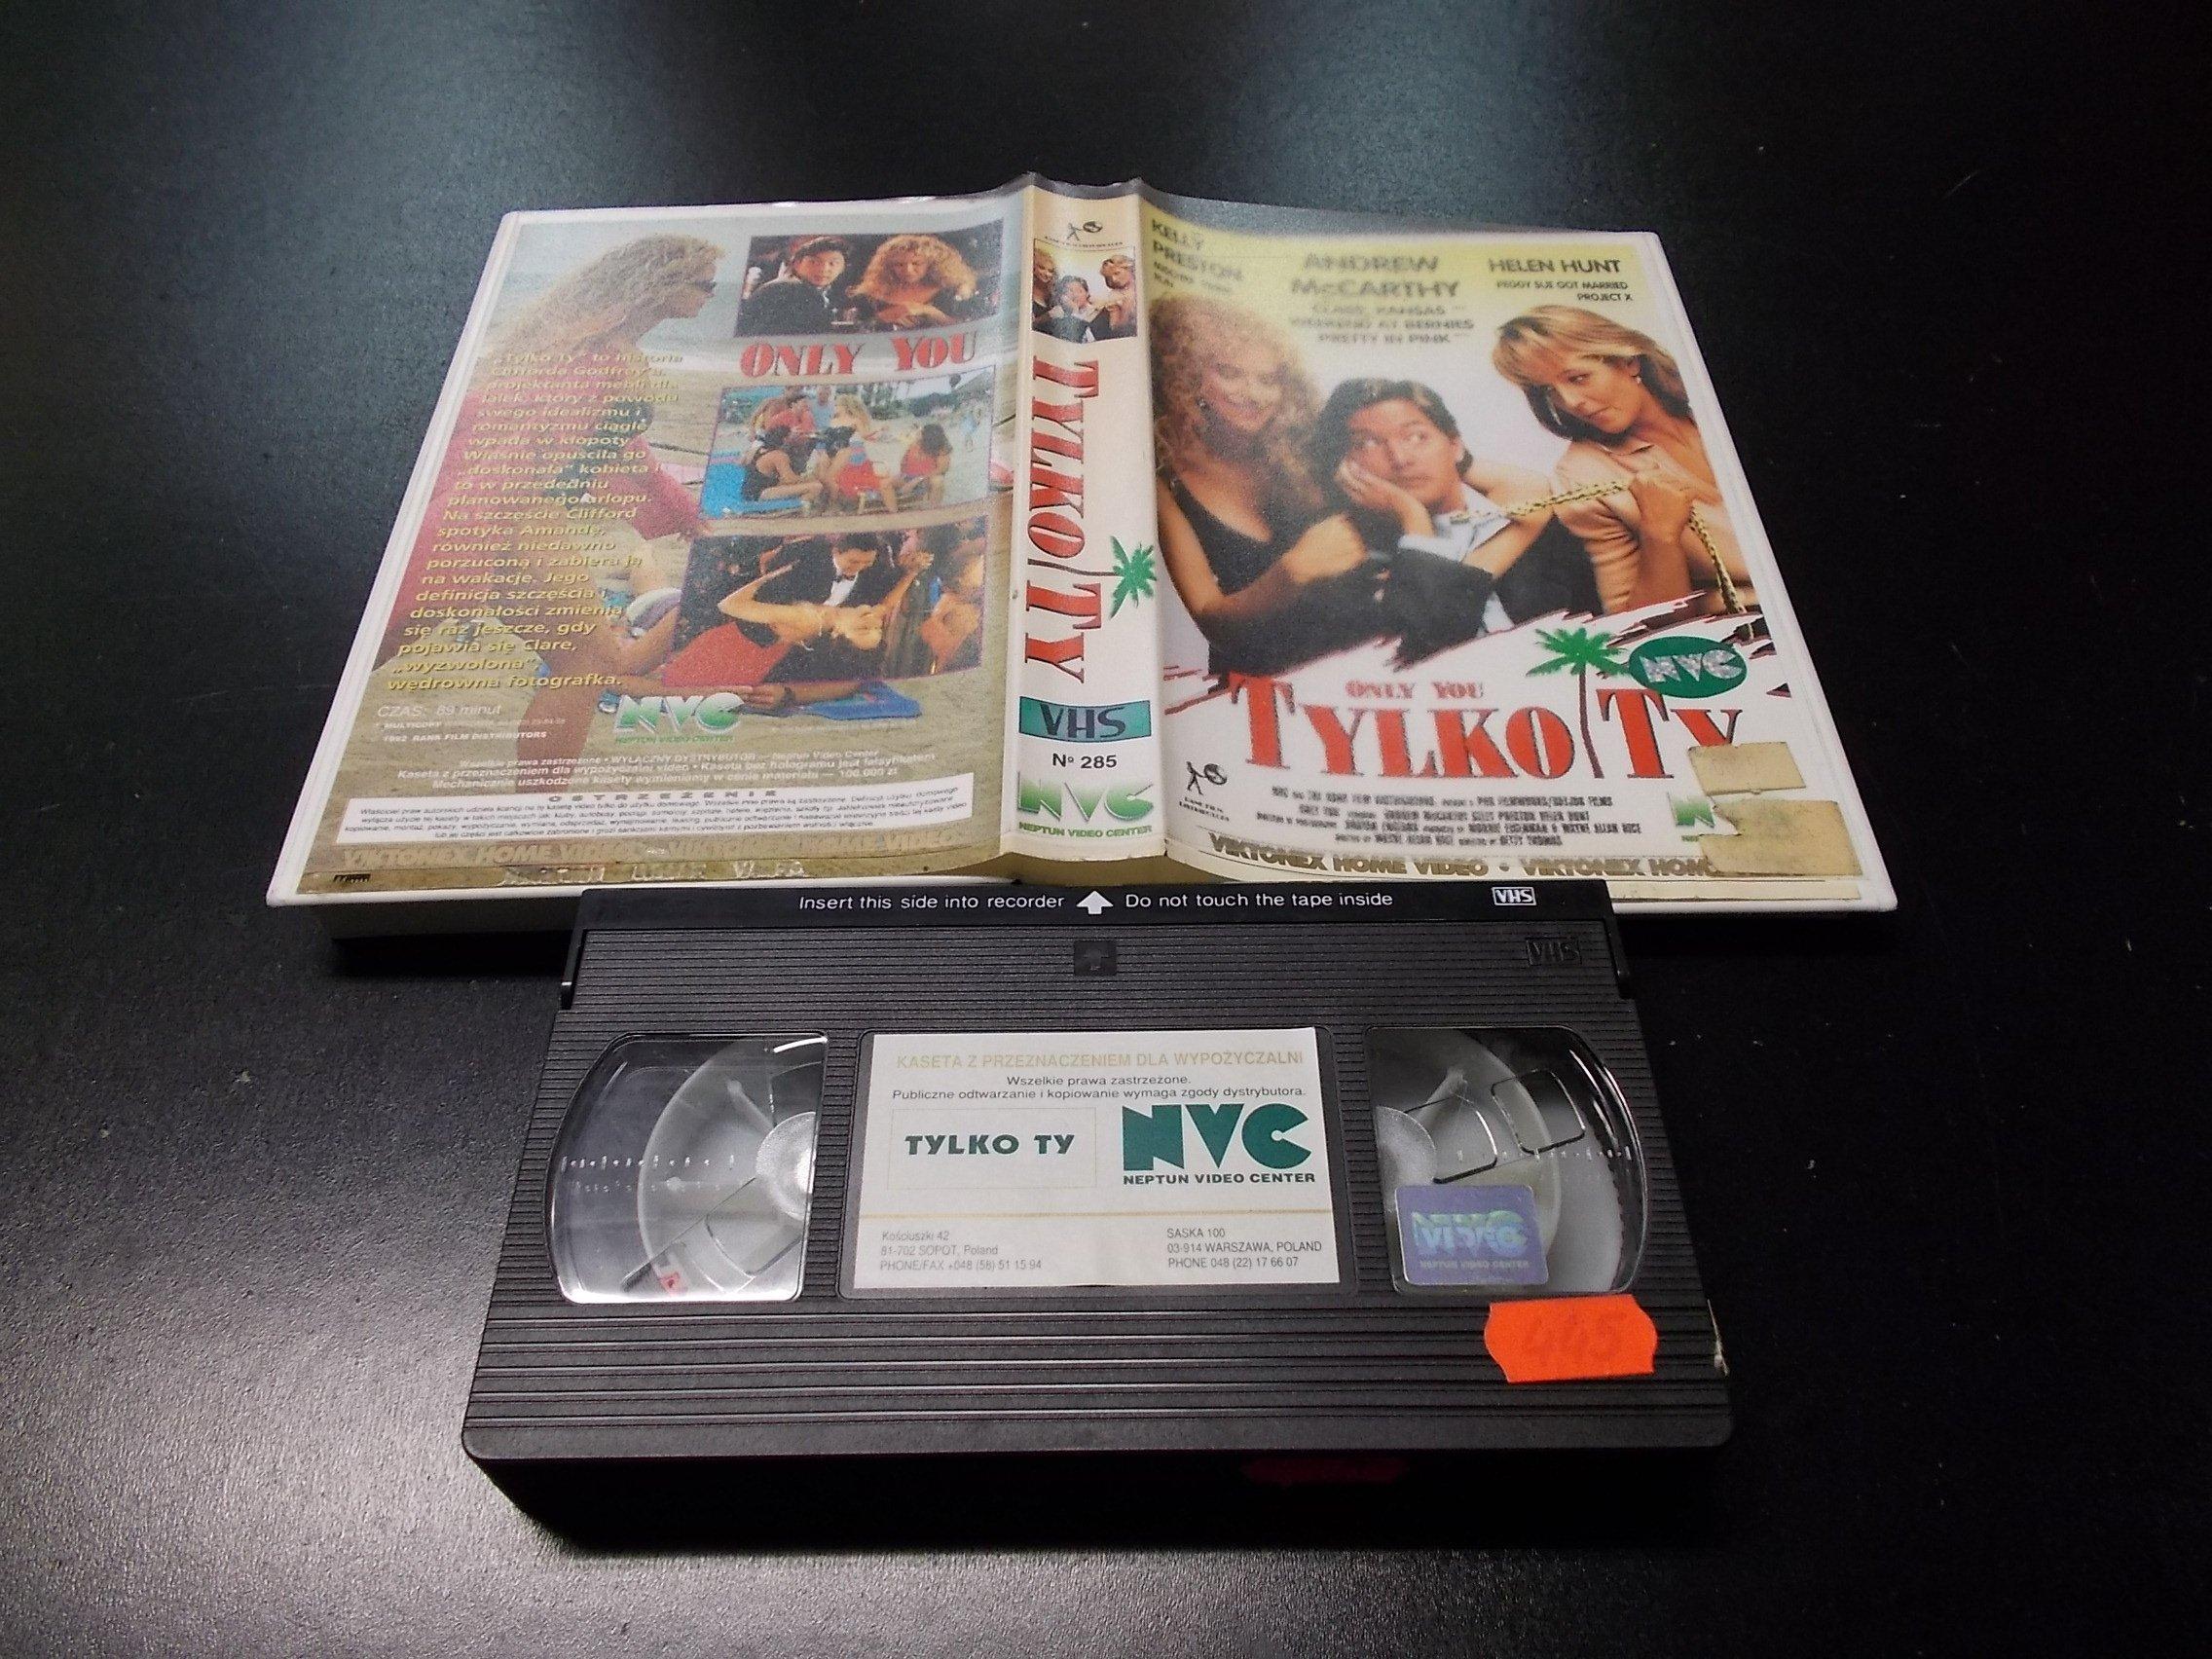 TYLKO TY -  kaseta VHS - 1174 Opole - AlleOpole.pl